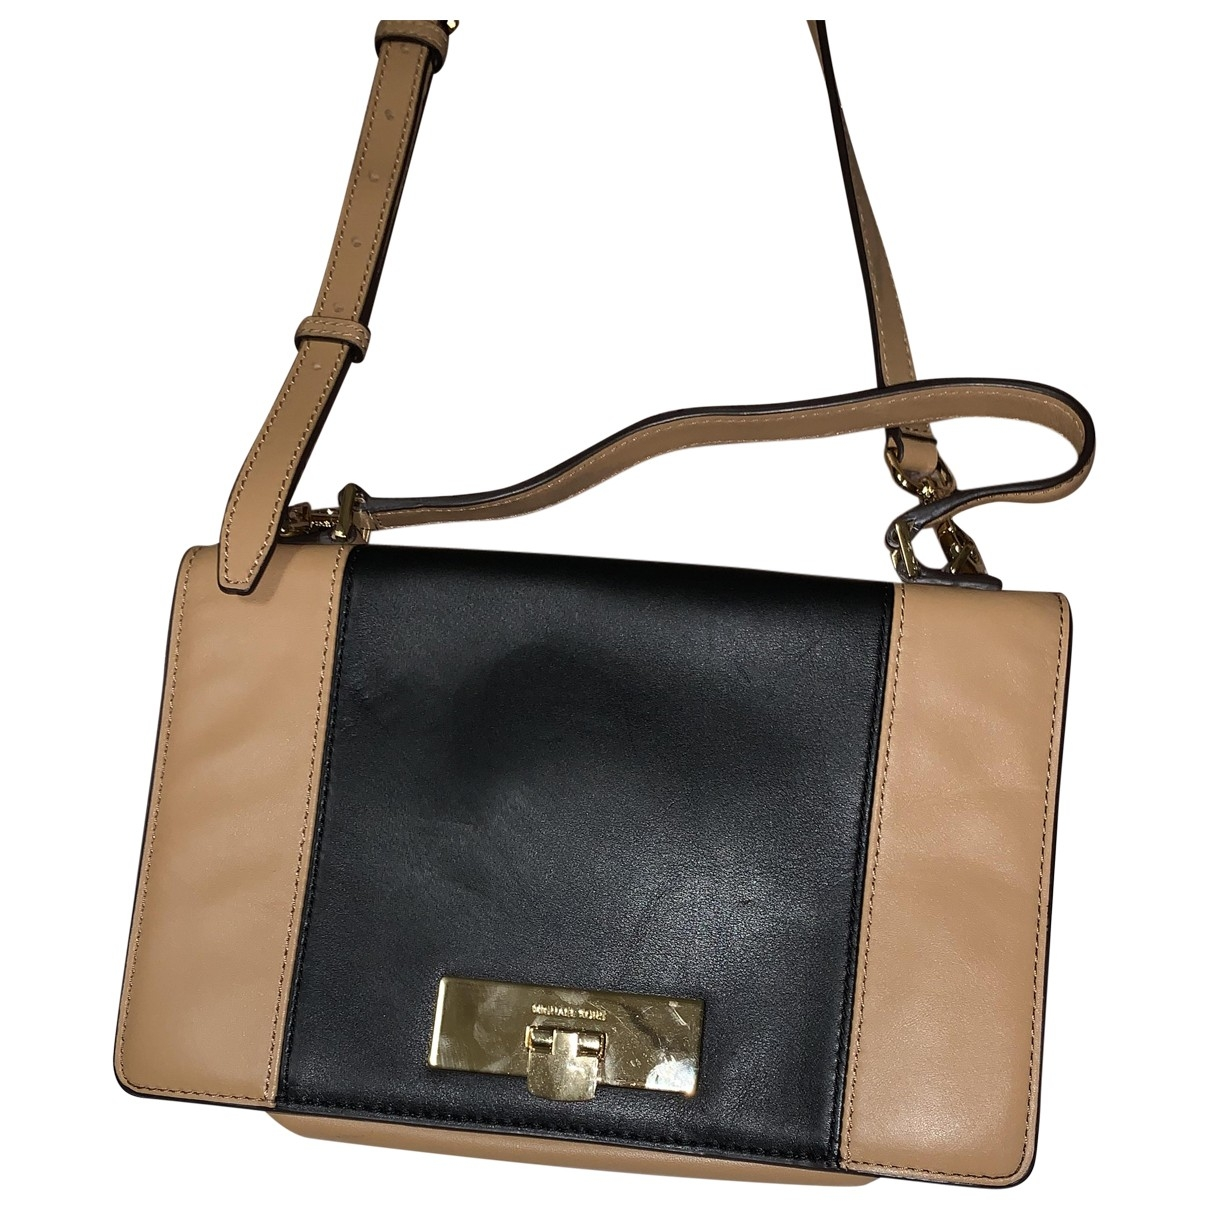 Michael Kors \N Beige Leather Clutch bag for Women \N